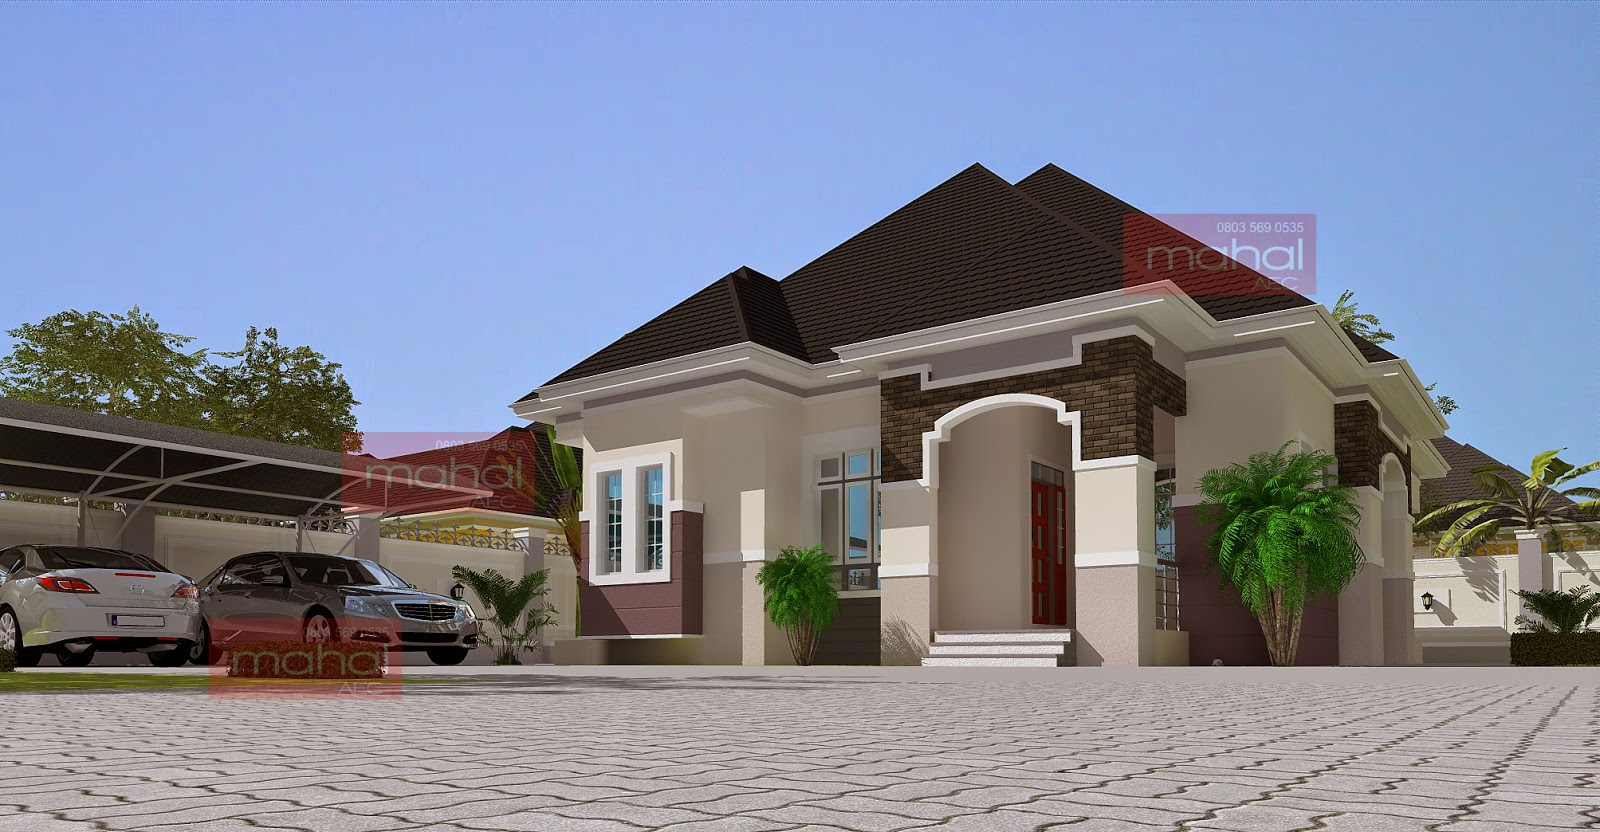 3 Bedroom Bungalow Amadi Flats